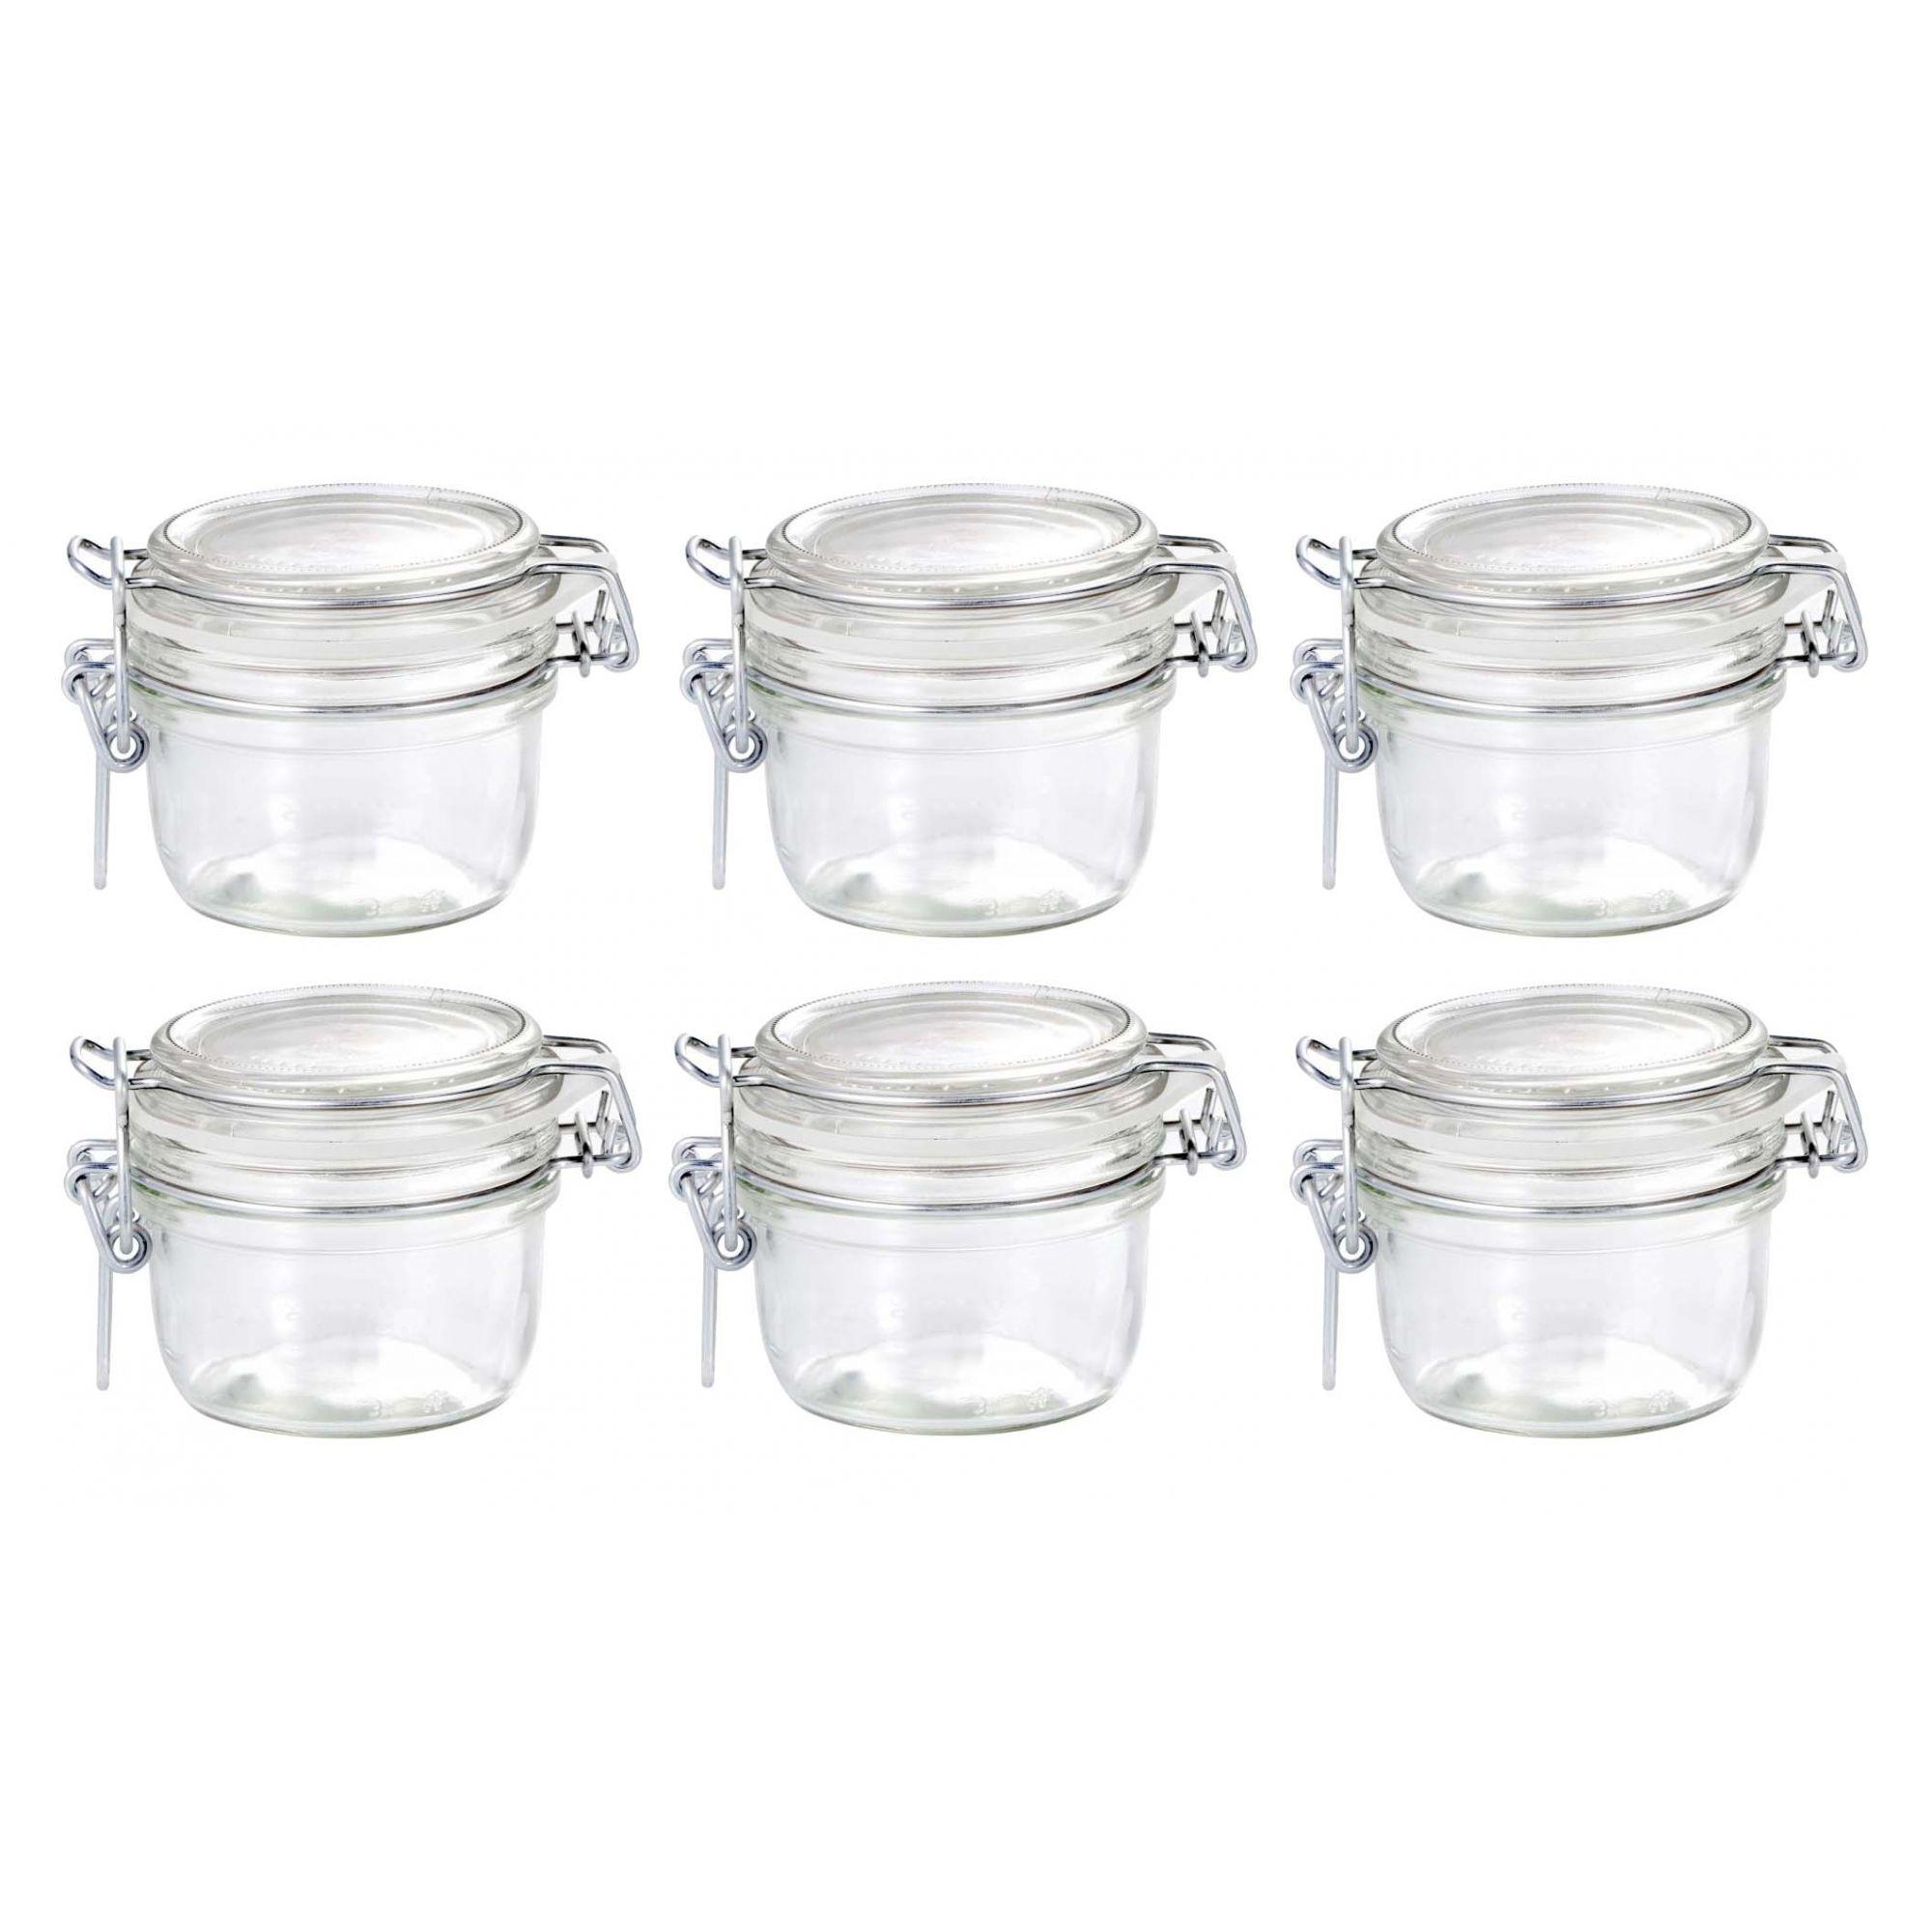 Conj 6 Pote de vidro hermético Fido Terrina 125 ml